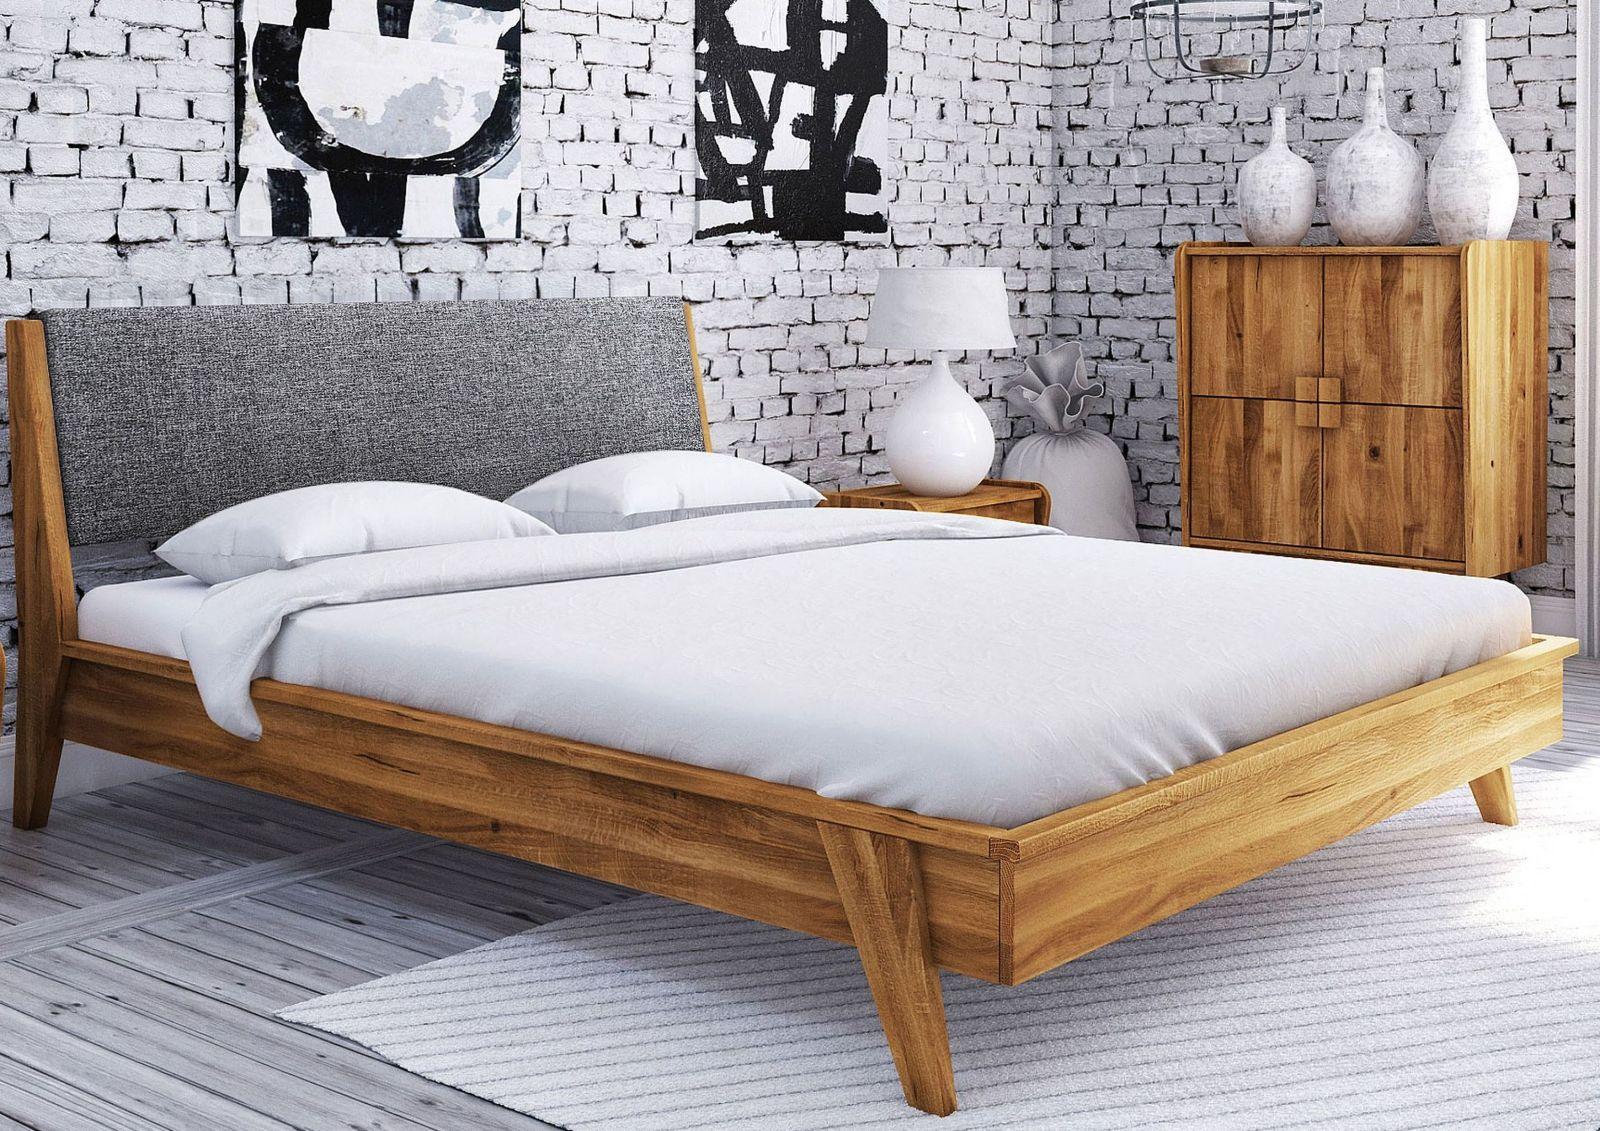 Full Size of Bett Massiv 180x200 Wasser 160x200 Mit Lattenrost Himmel Amerikanische Betten Weißes 120x200 Wand Bestes Selber Bauen 180x220 Ebay Bett Bett Massiv 180x200